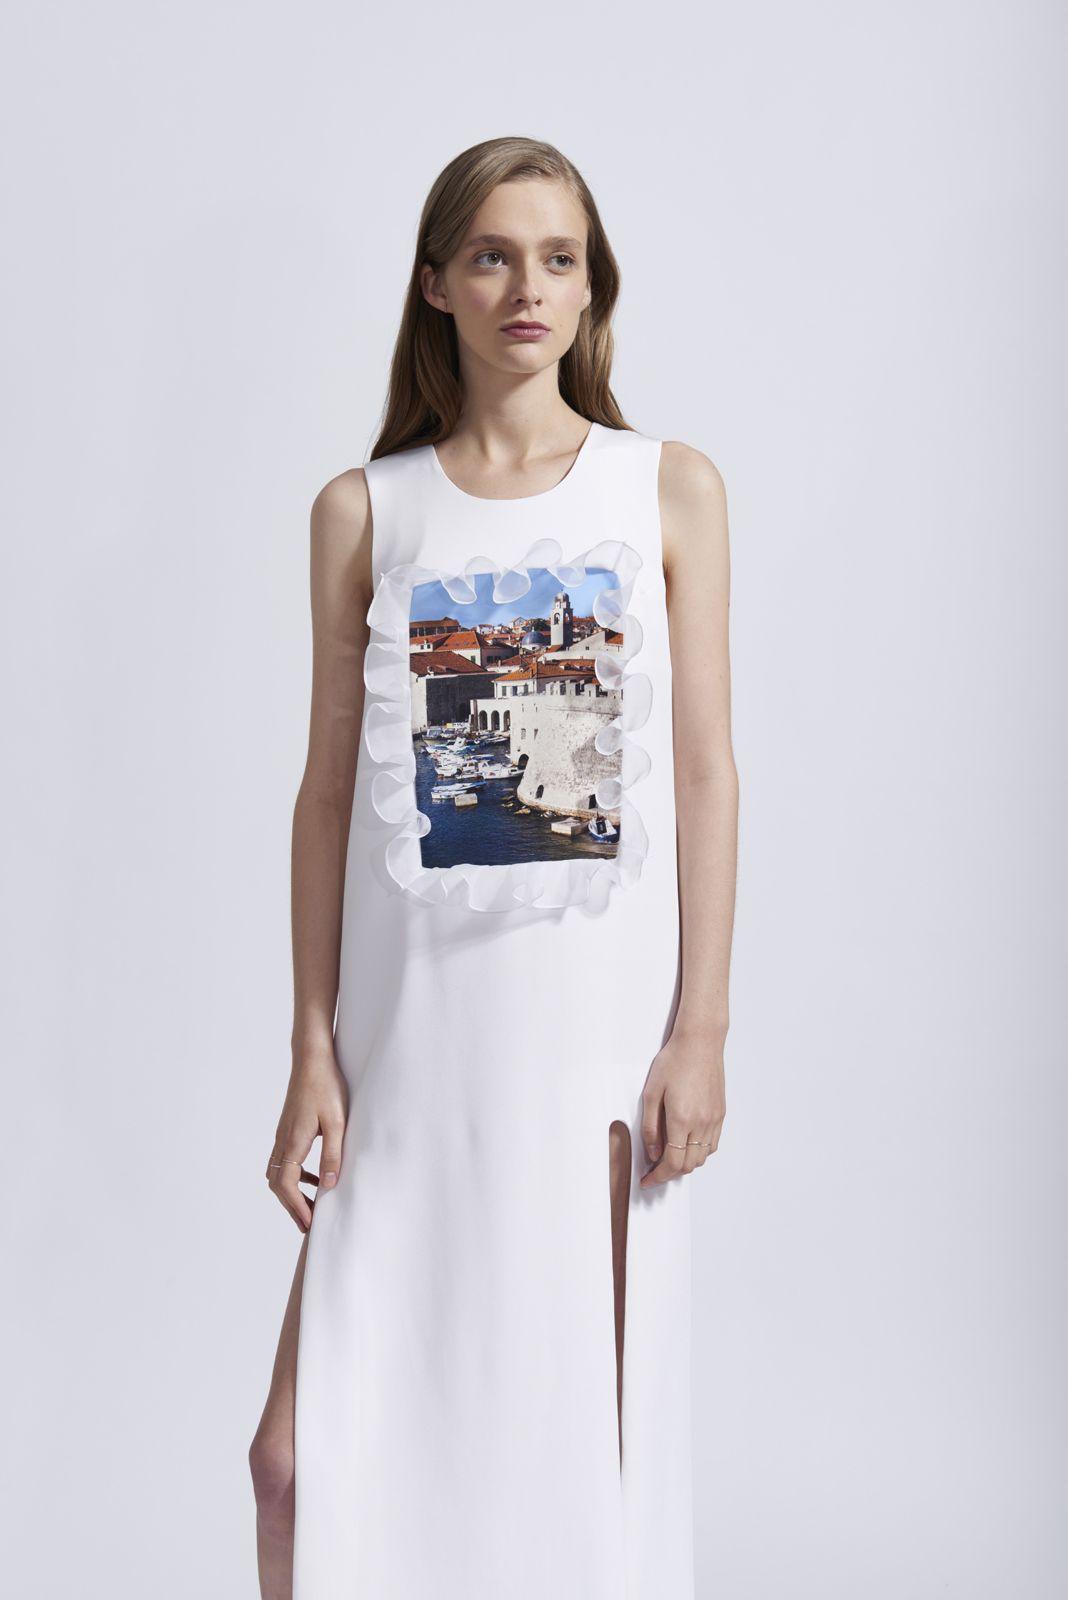 POSTCARD DRESS Fashion, Outfits, Silk organza